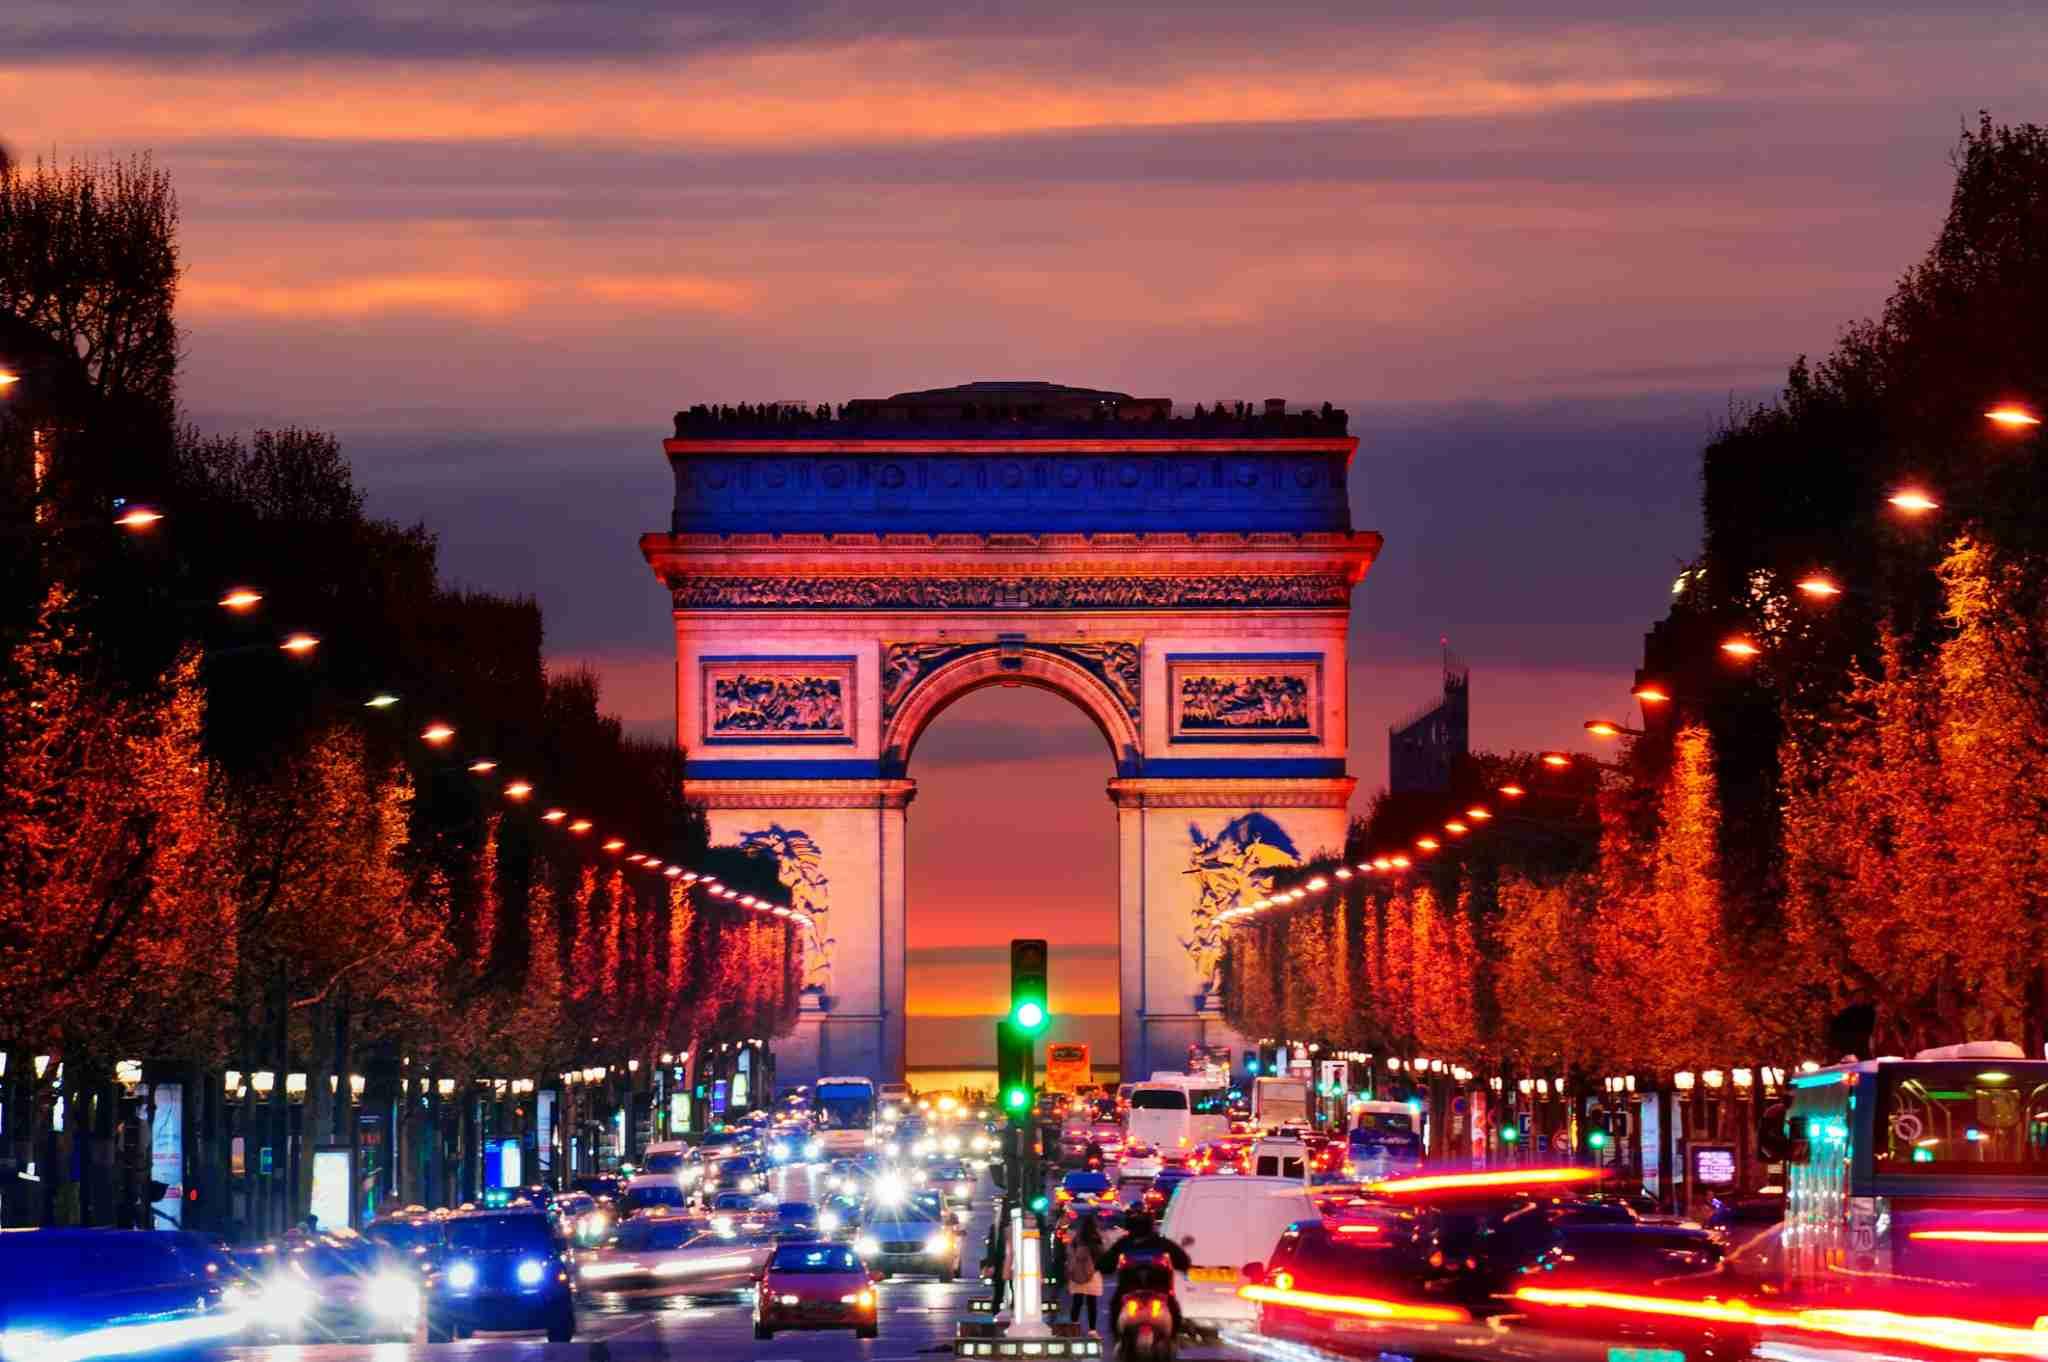 Arc de Triomphe (Photo by Spaces Images/Getty Images.)